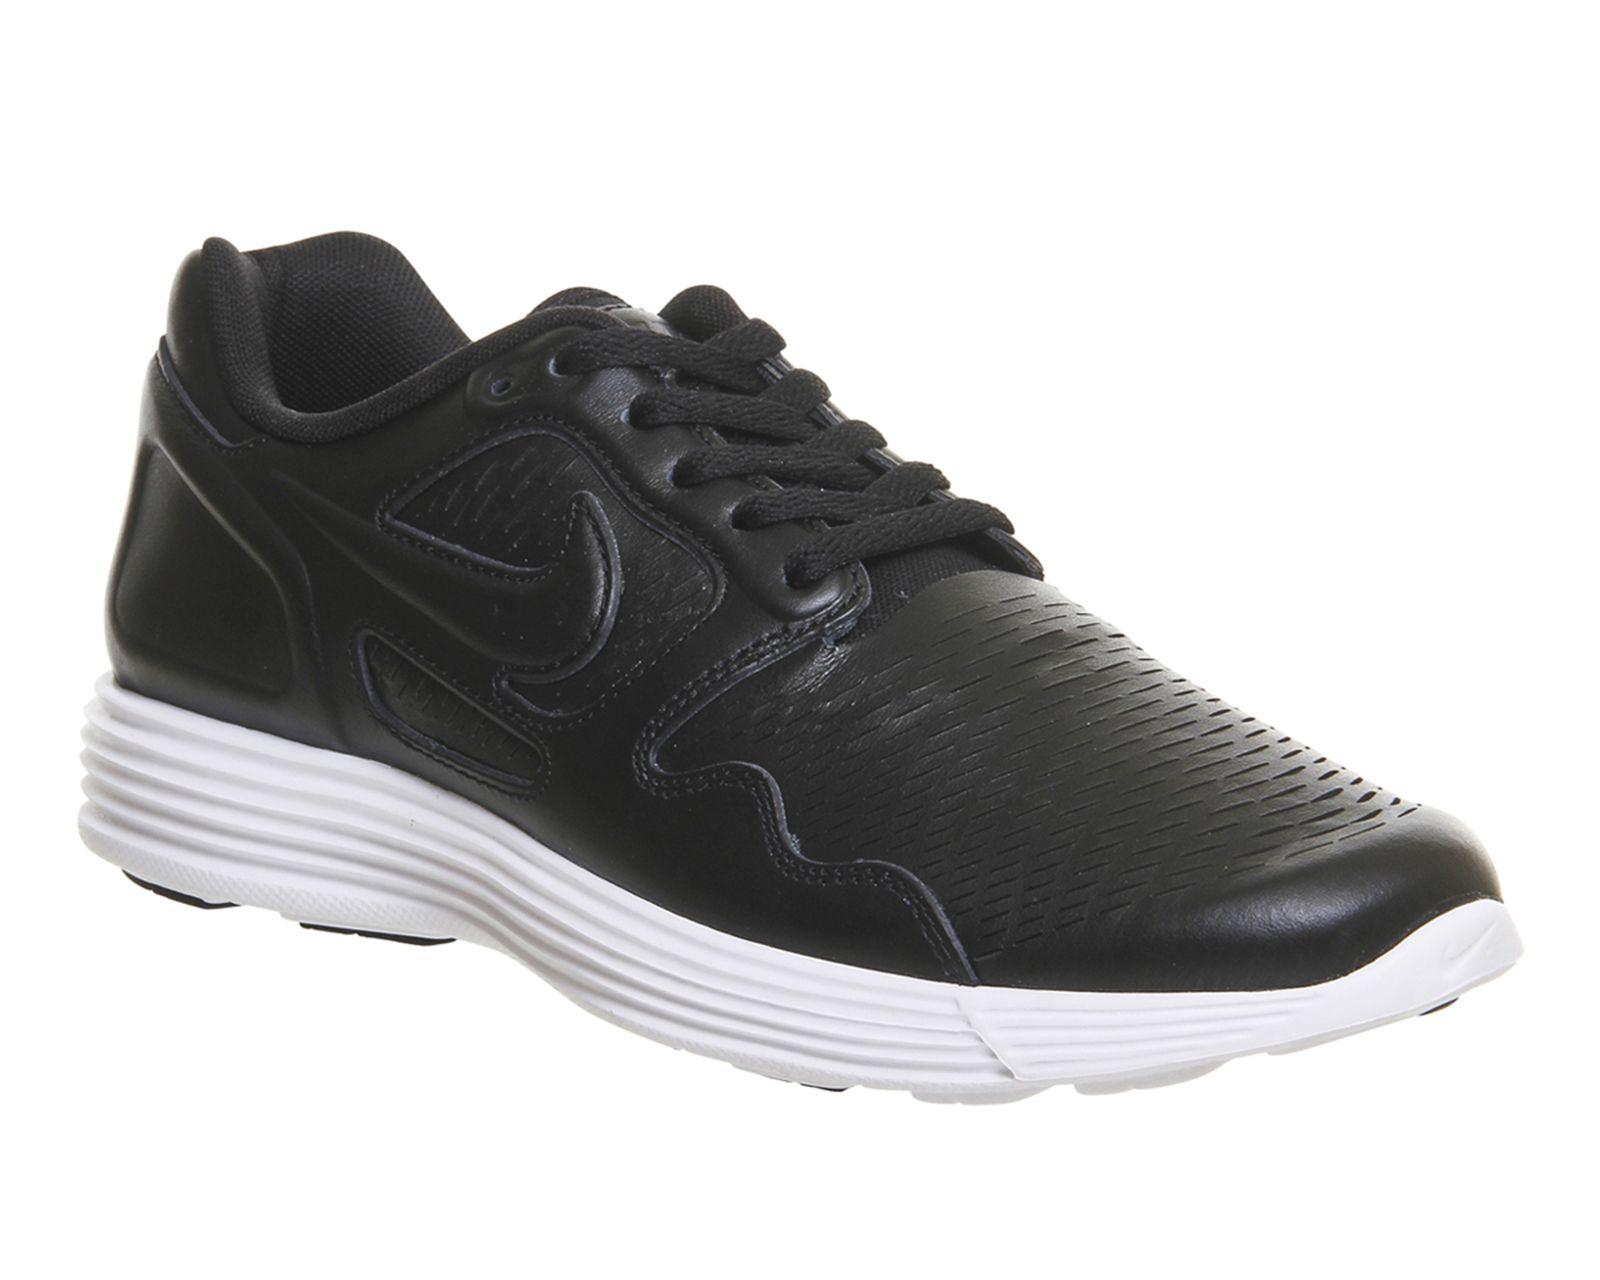 quality design 0948a a2903 Nike, Lunar Flow Lsr Prm, Black Black White